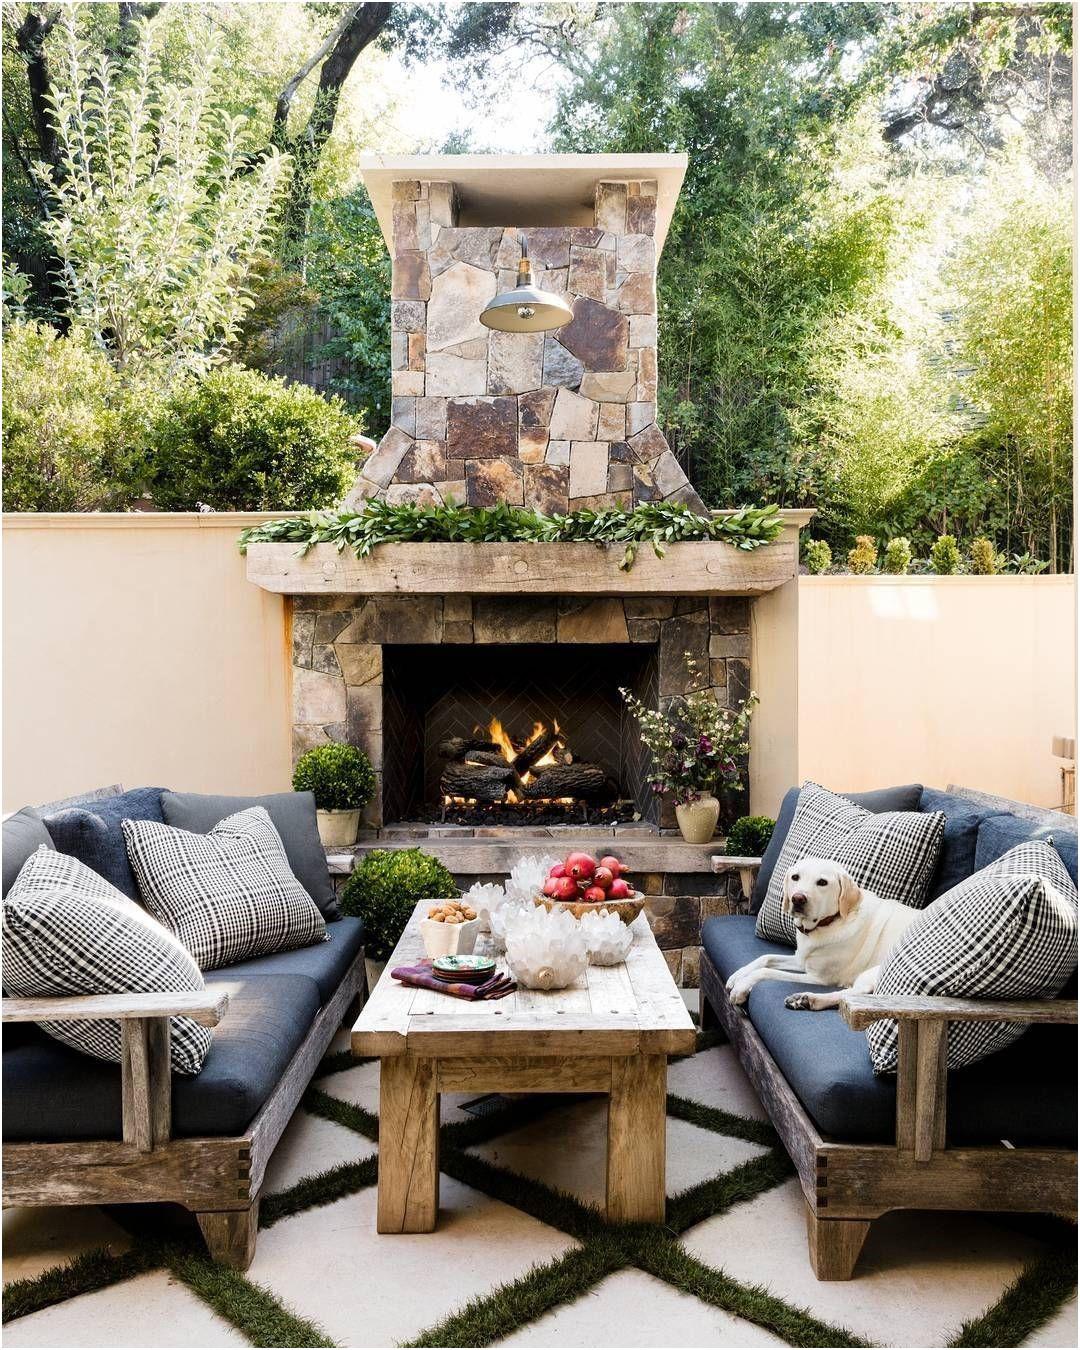 Backyard Ideas with Fireplace Awesome Patio Fireplace Idea the Simple Gardener